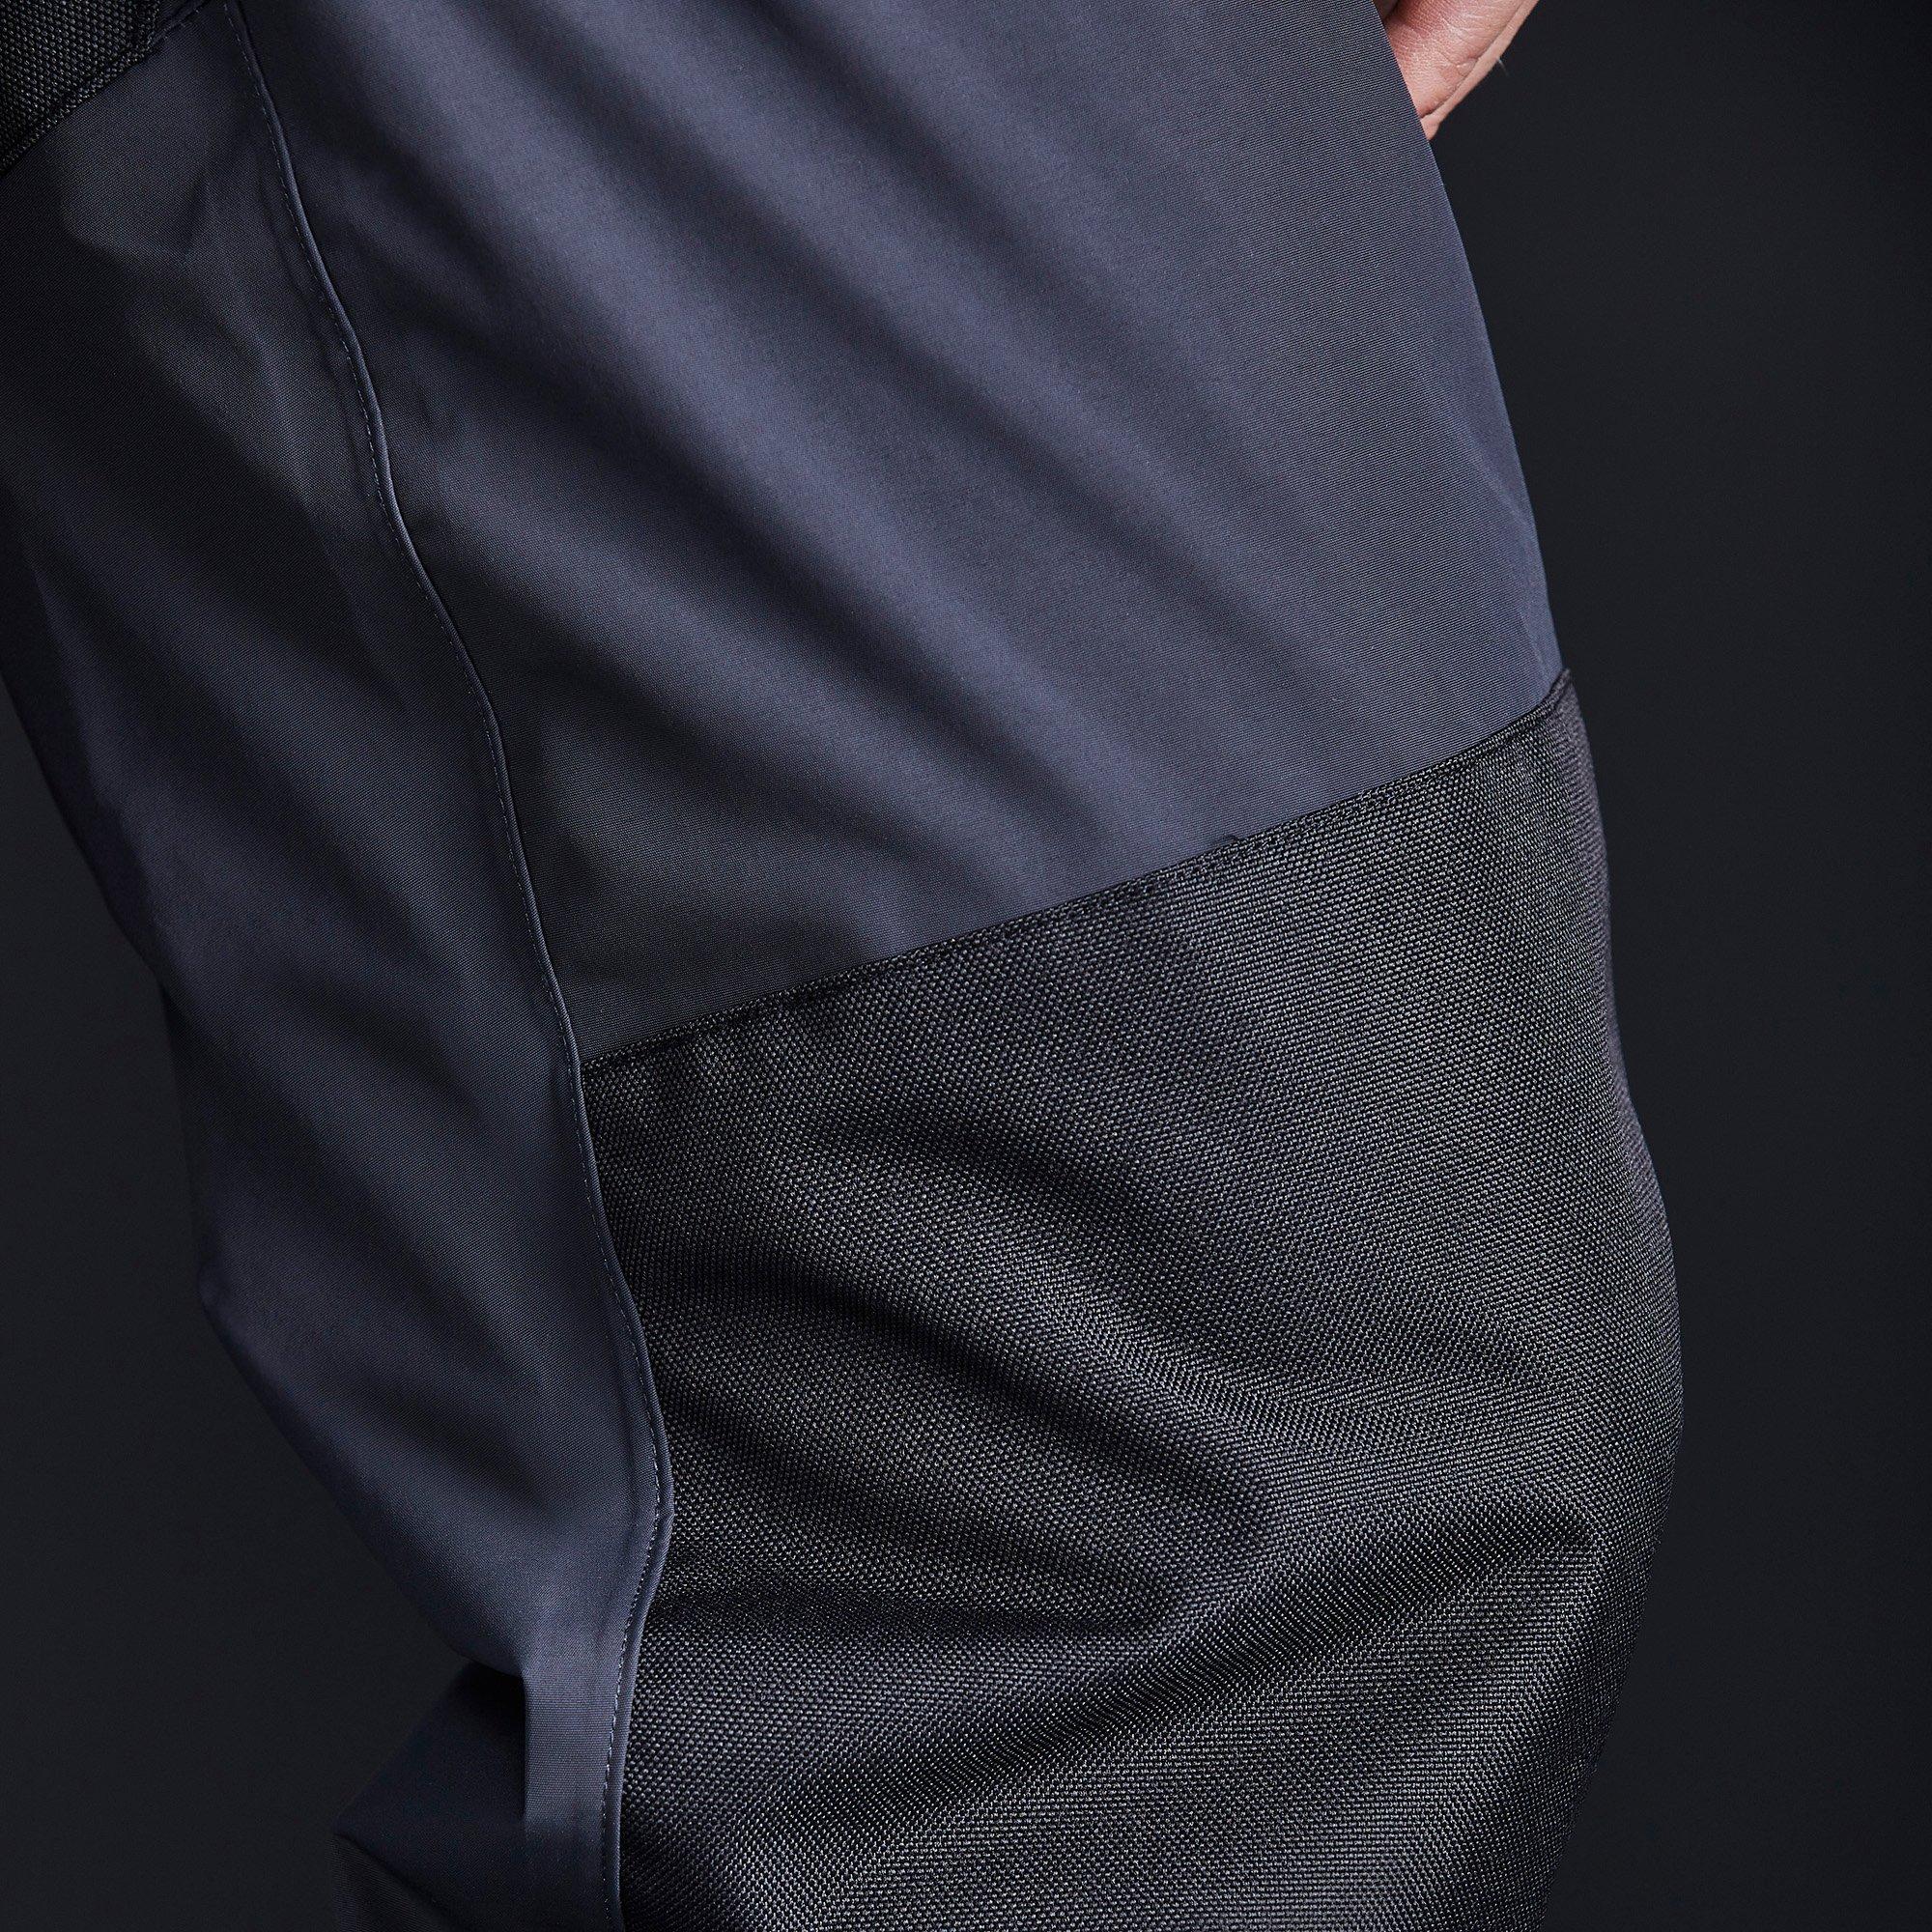 Women's OS3 Coastal Trousers - OS32TW-GRA01-MODEL_8.jpg